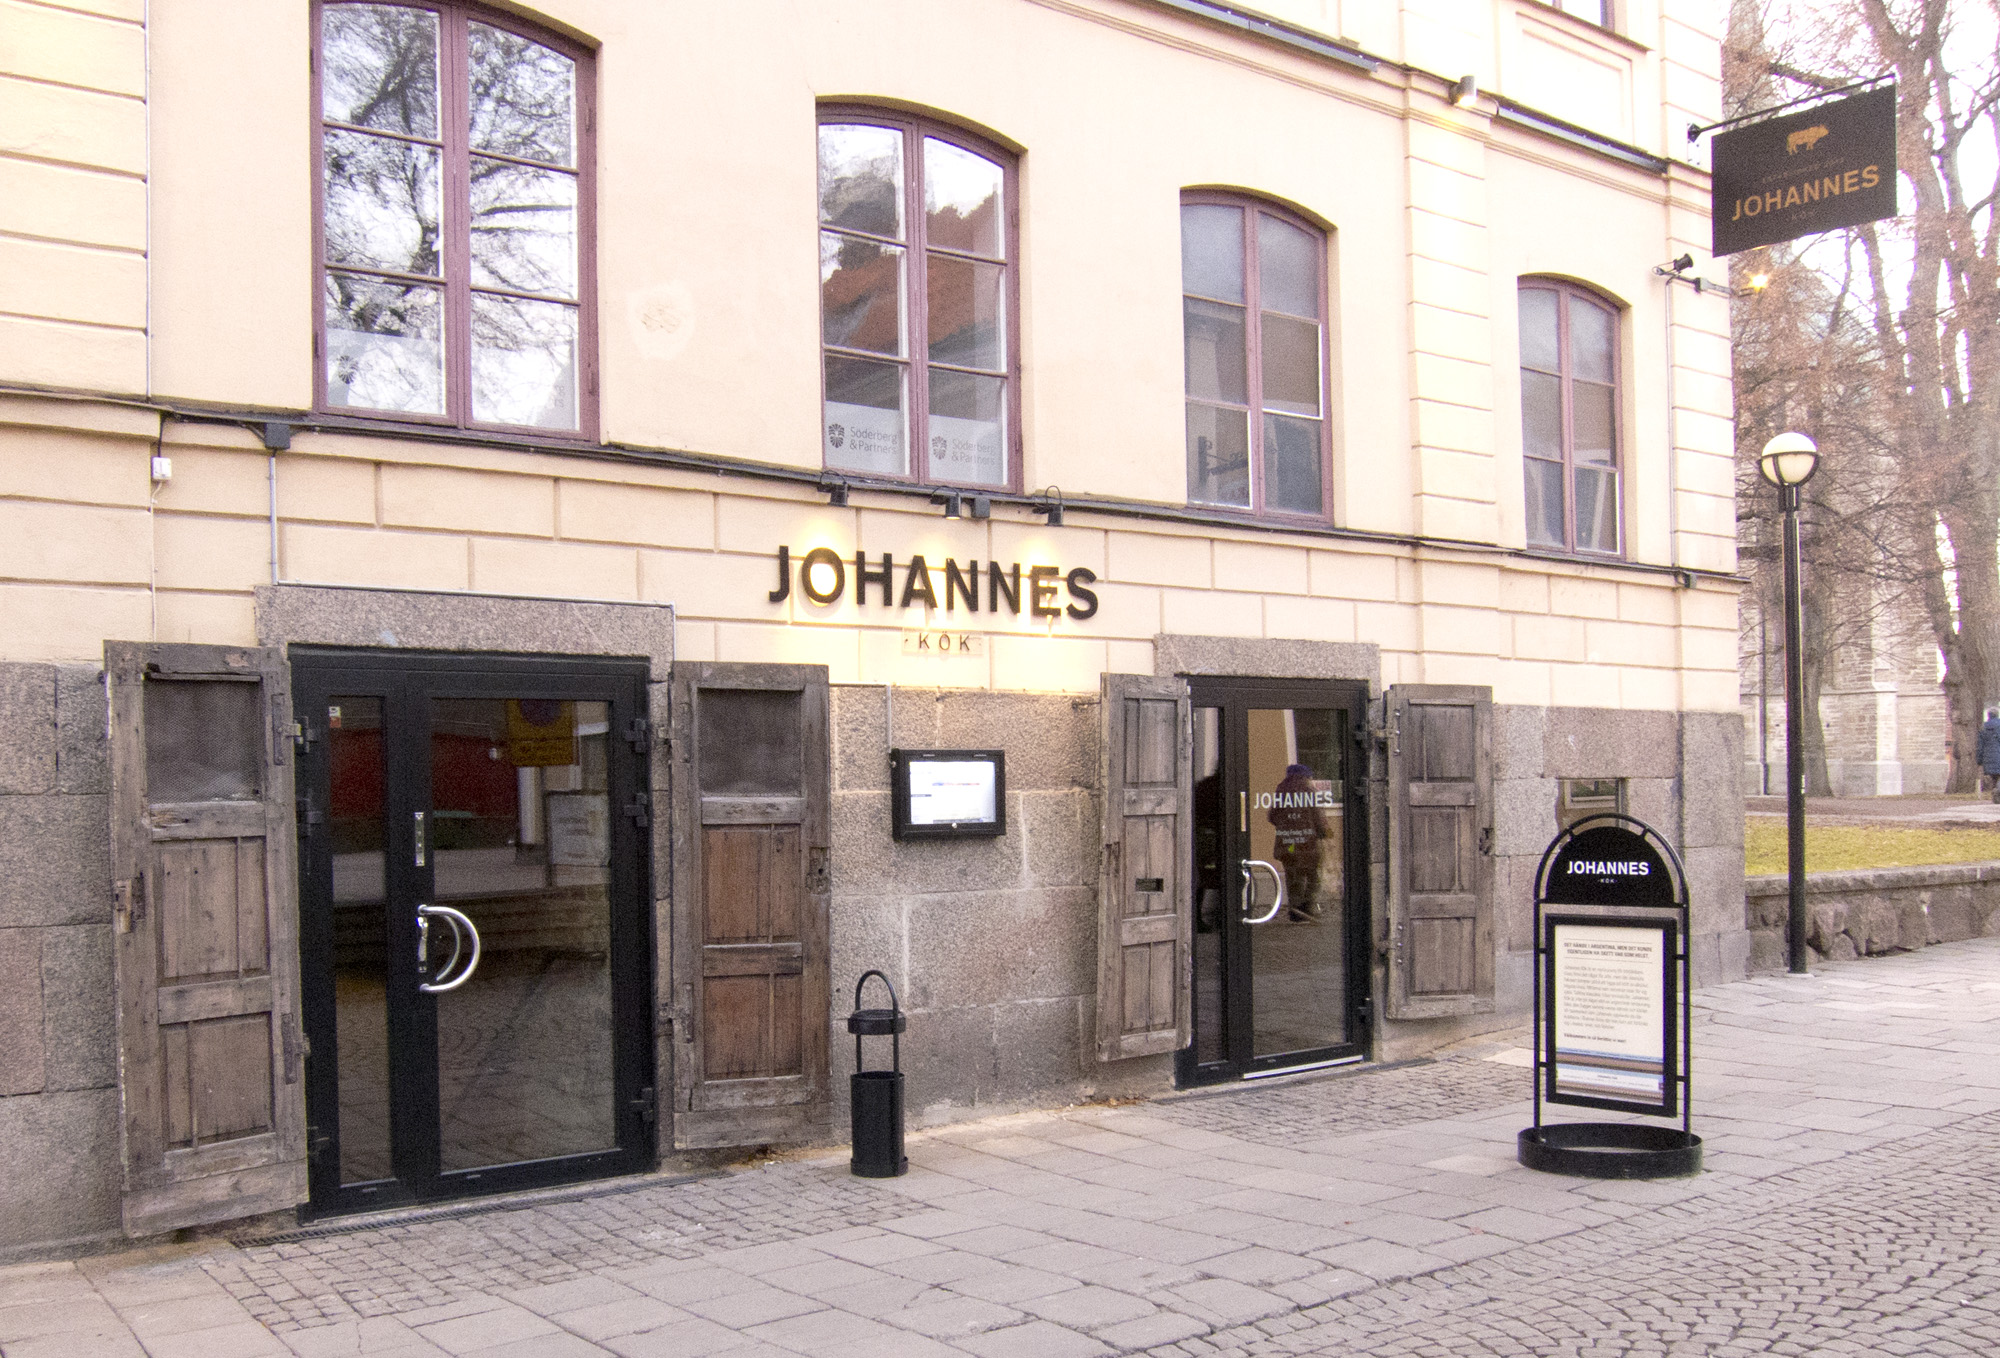 2016-03-27 Johannes kök 02